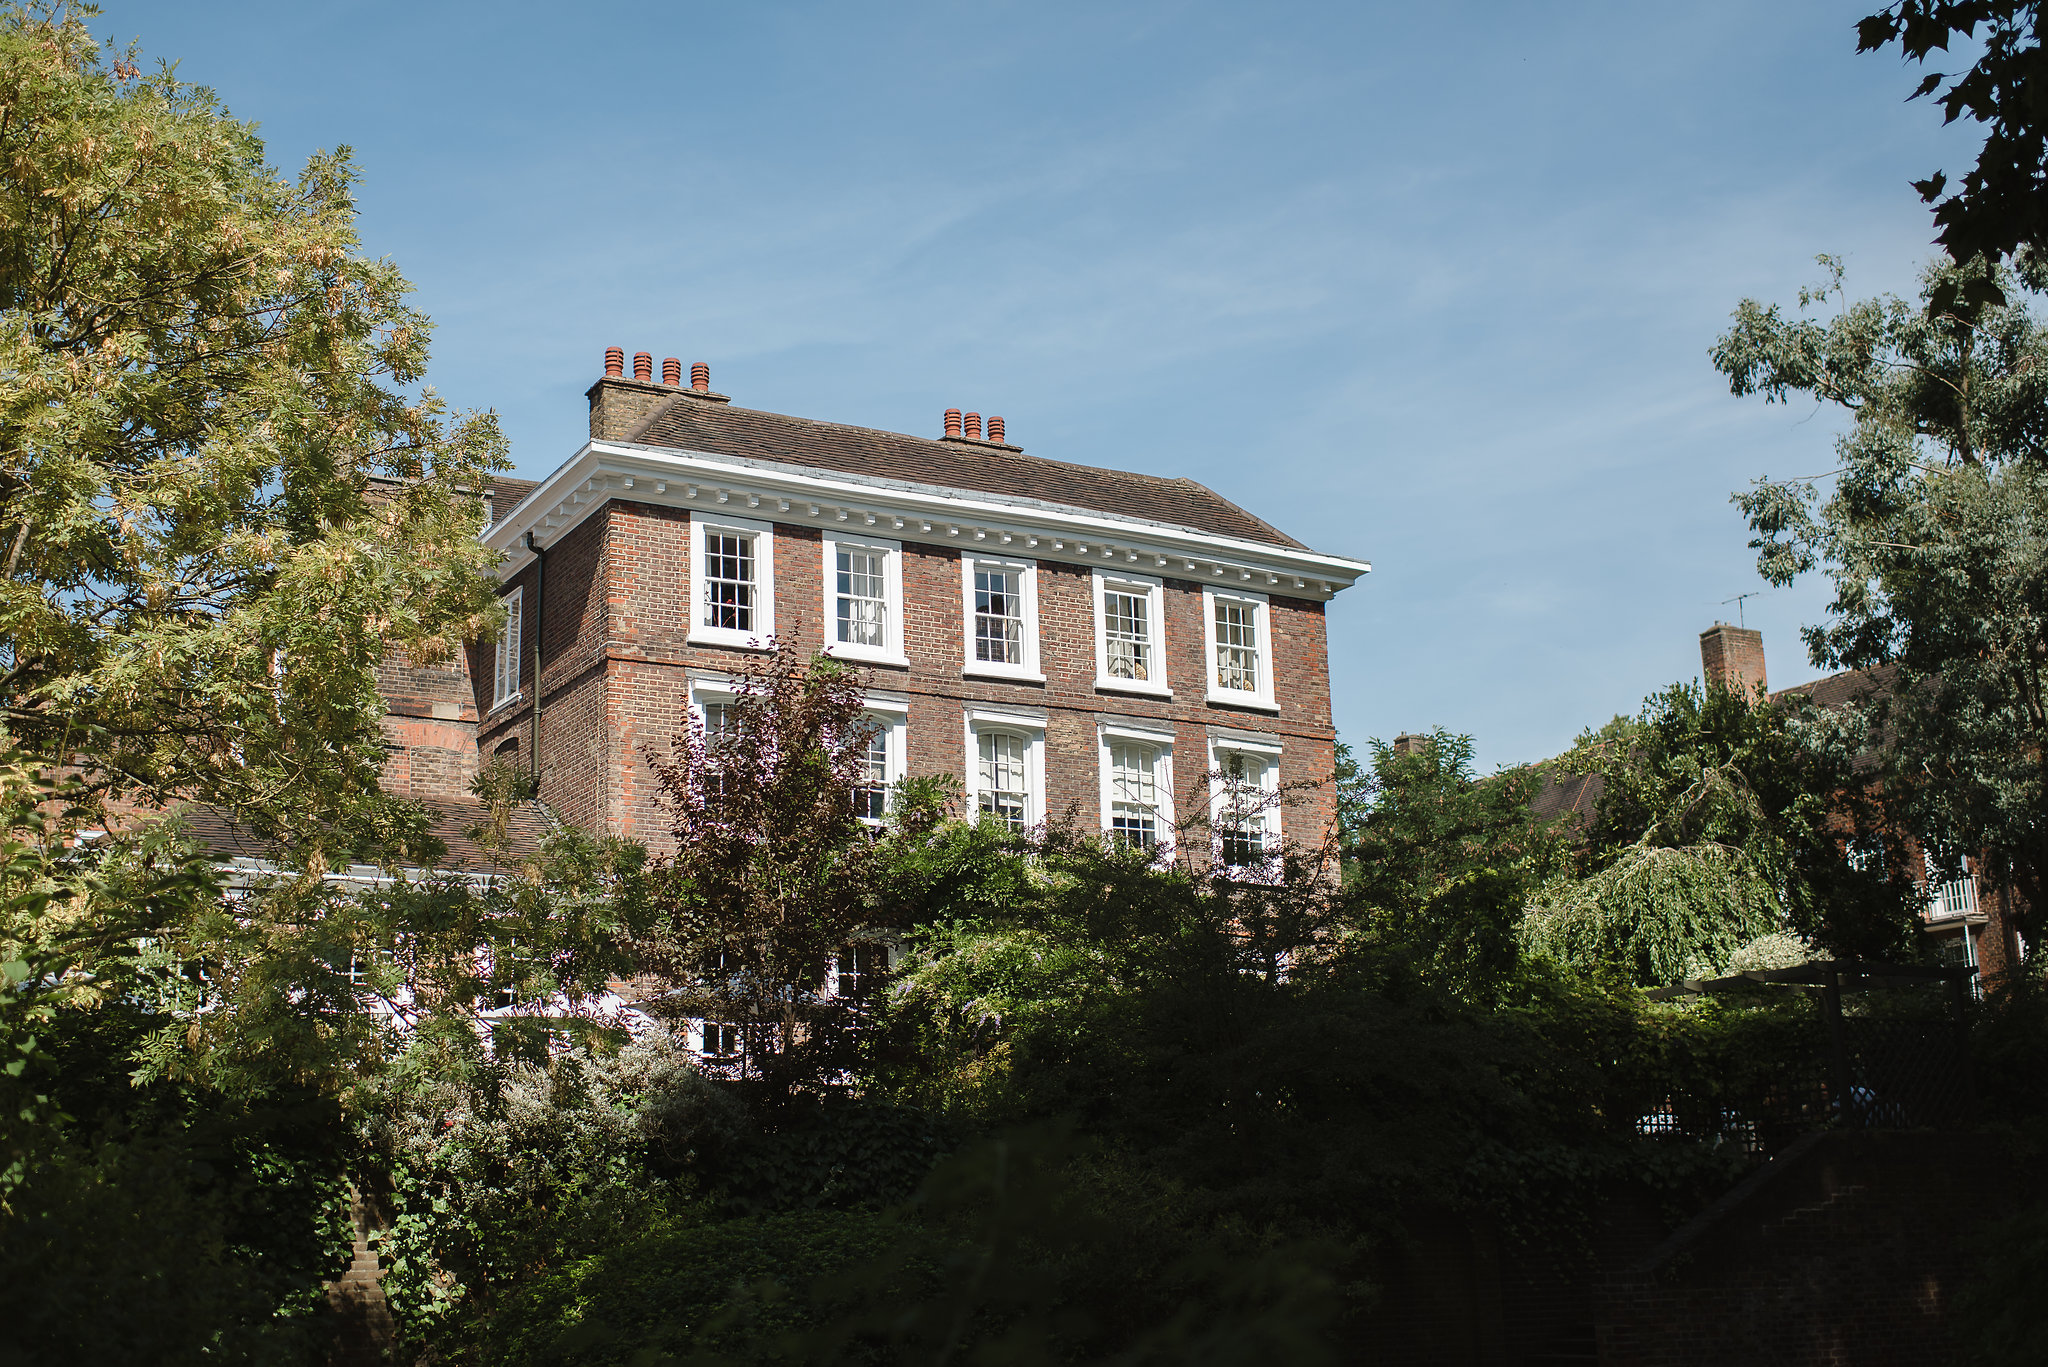 Burgh_House_Hamptead_Museum_Prince_Albert_Camden_Emma_Hare_Photography_1.jpg